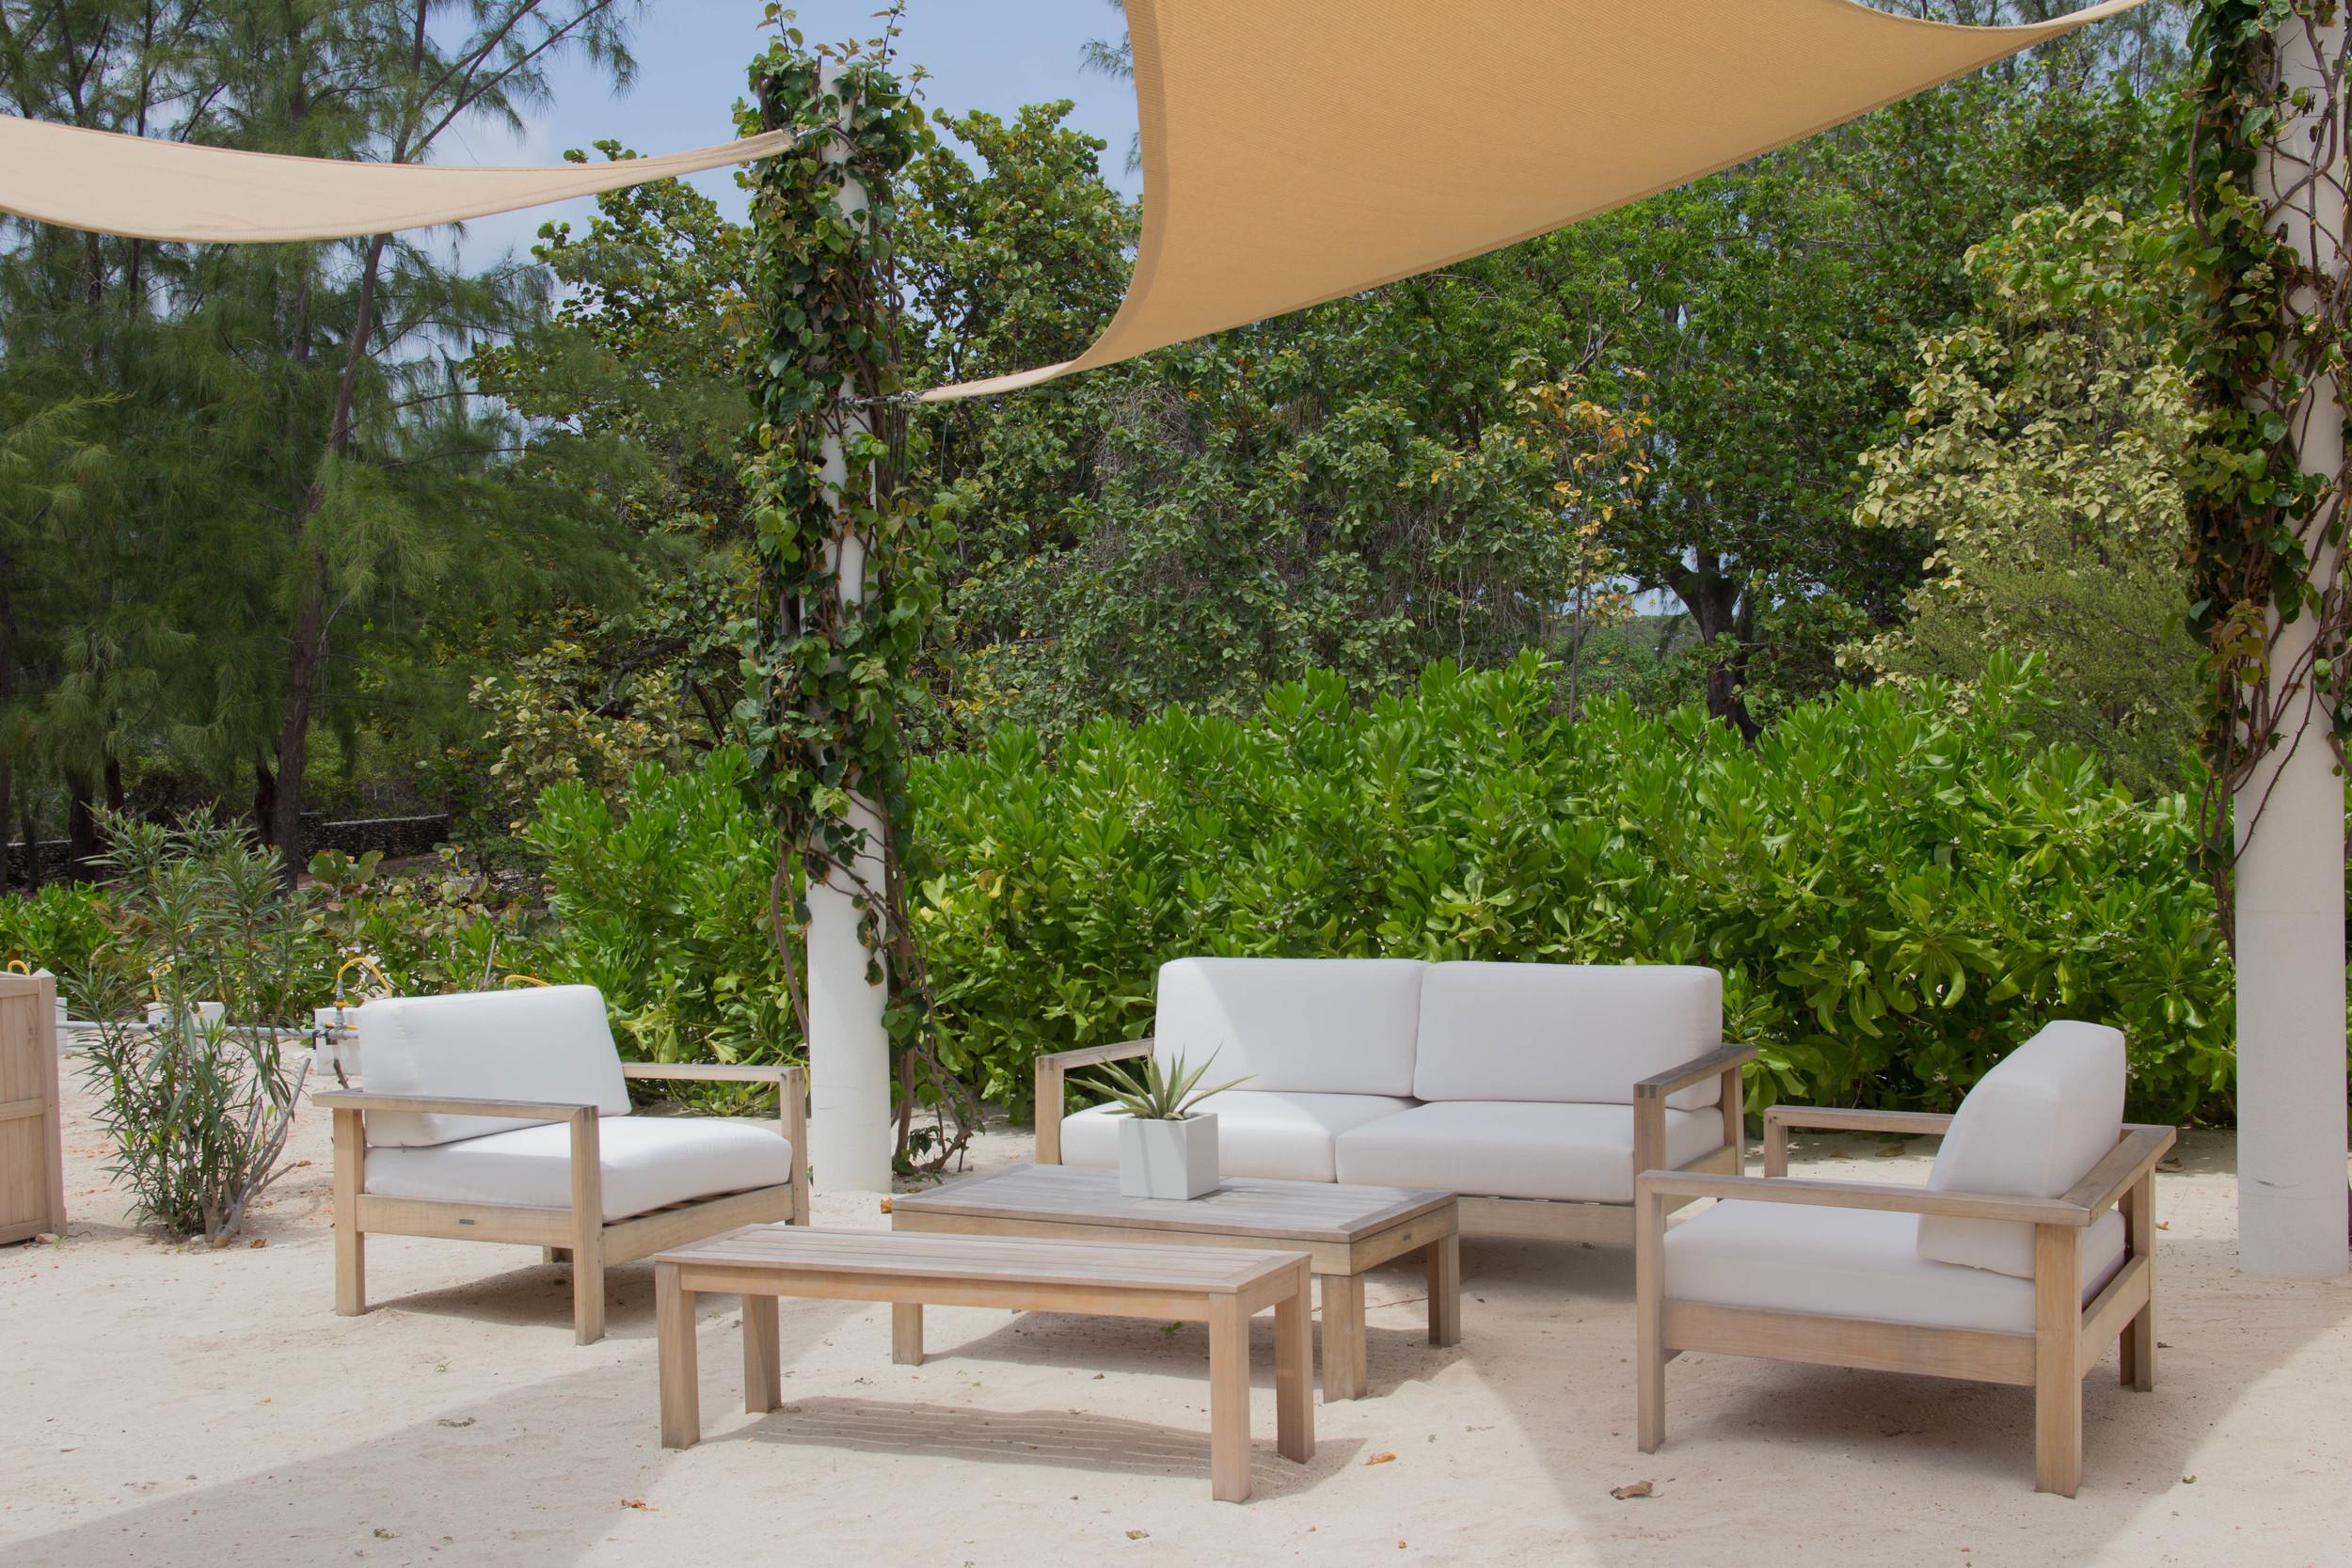 le soleil d'or, cayman brac, grand cayman islands, caribbean islands, vacation, farm, fresh, organic, mimosas, beach, bcbg panama hat